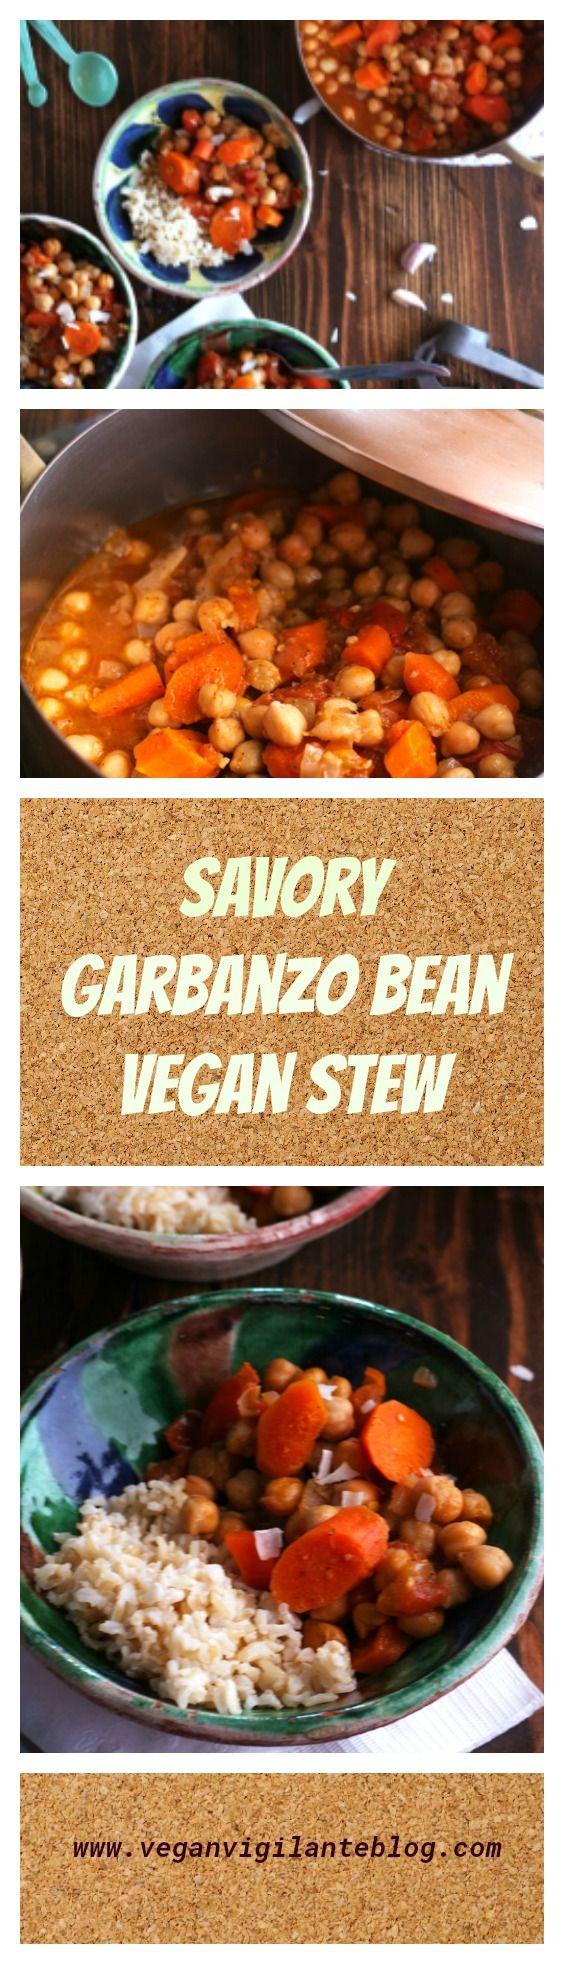 Savory Garbanzo Bean Vegan Stew